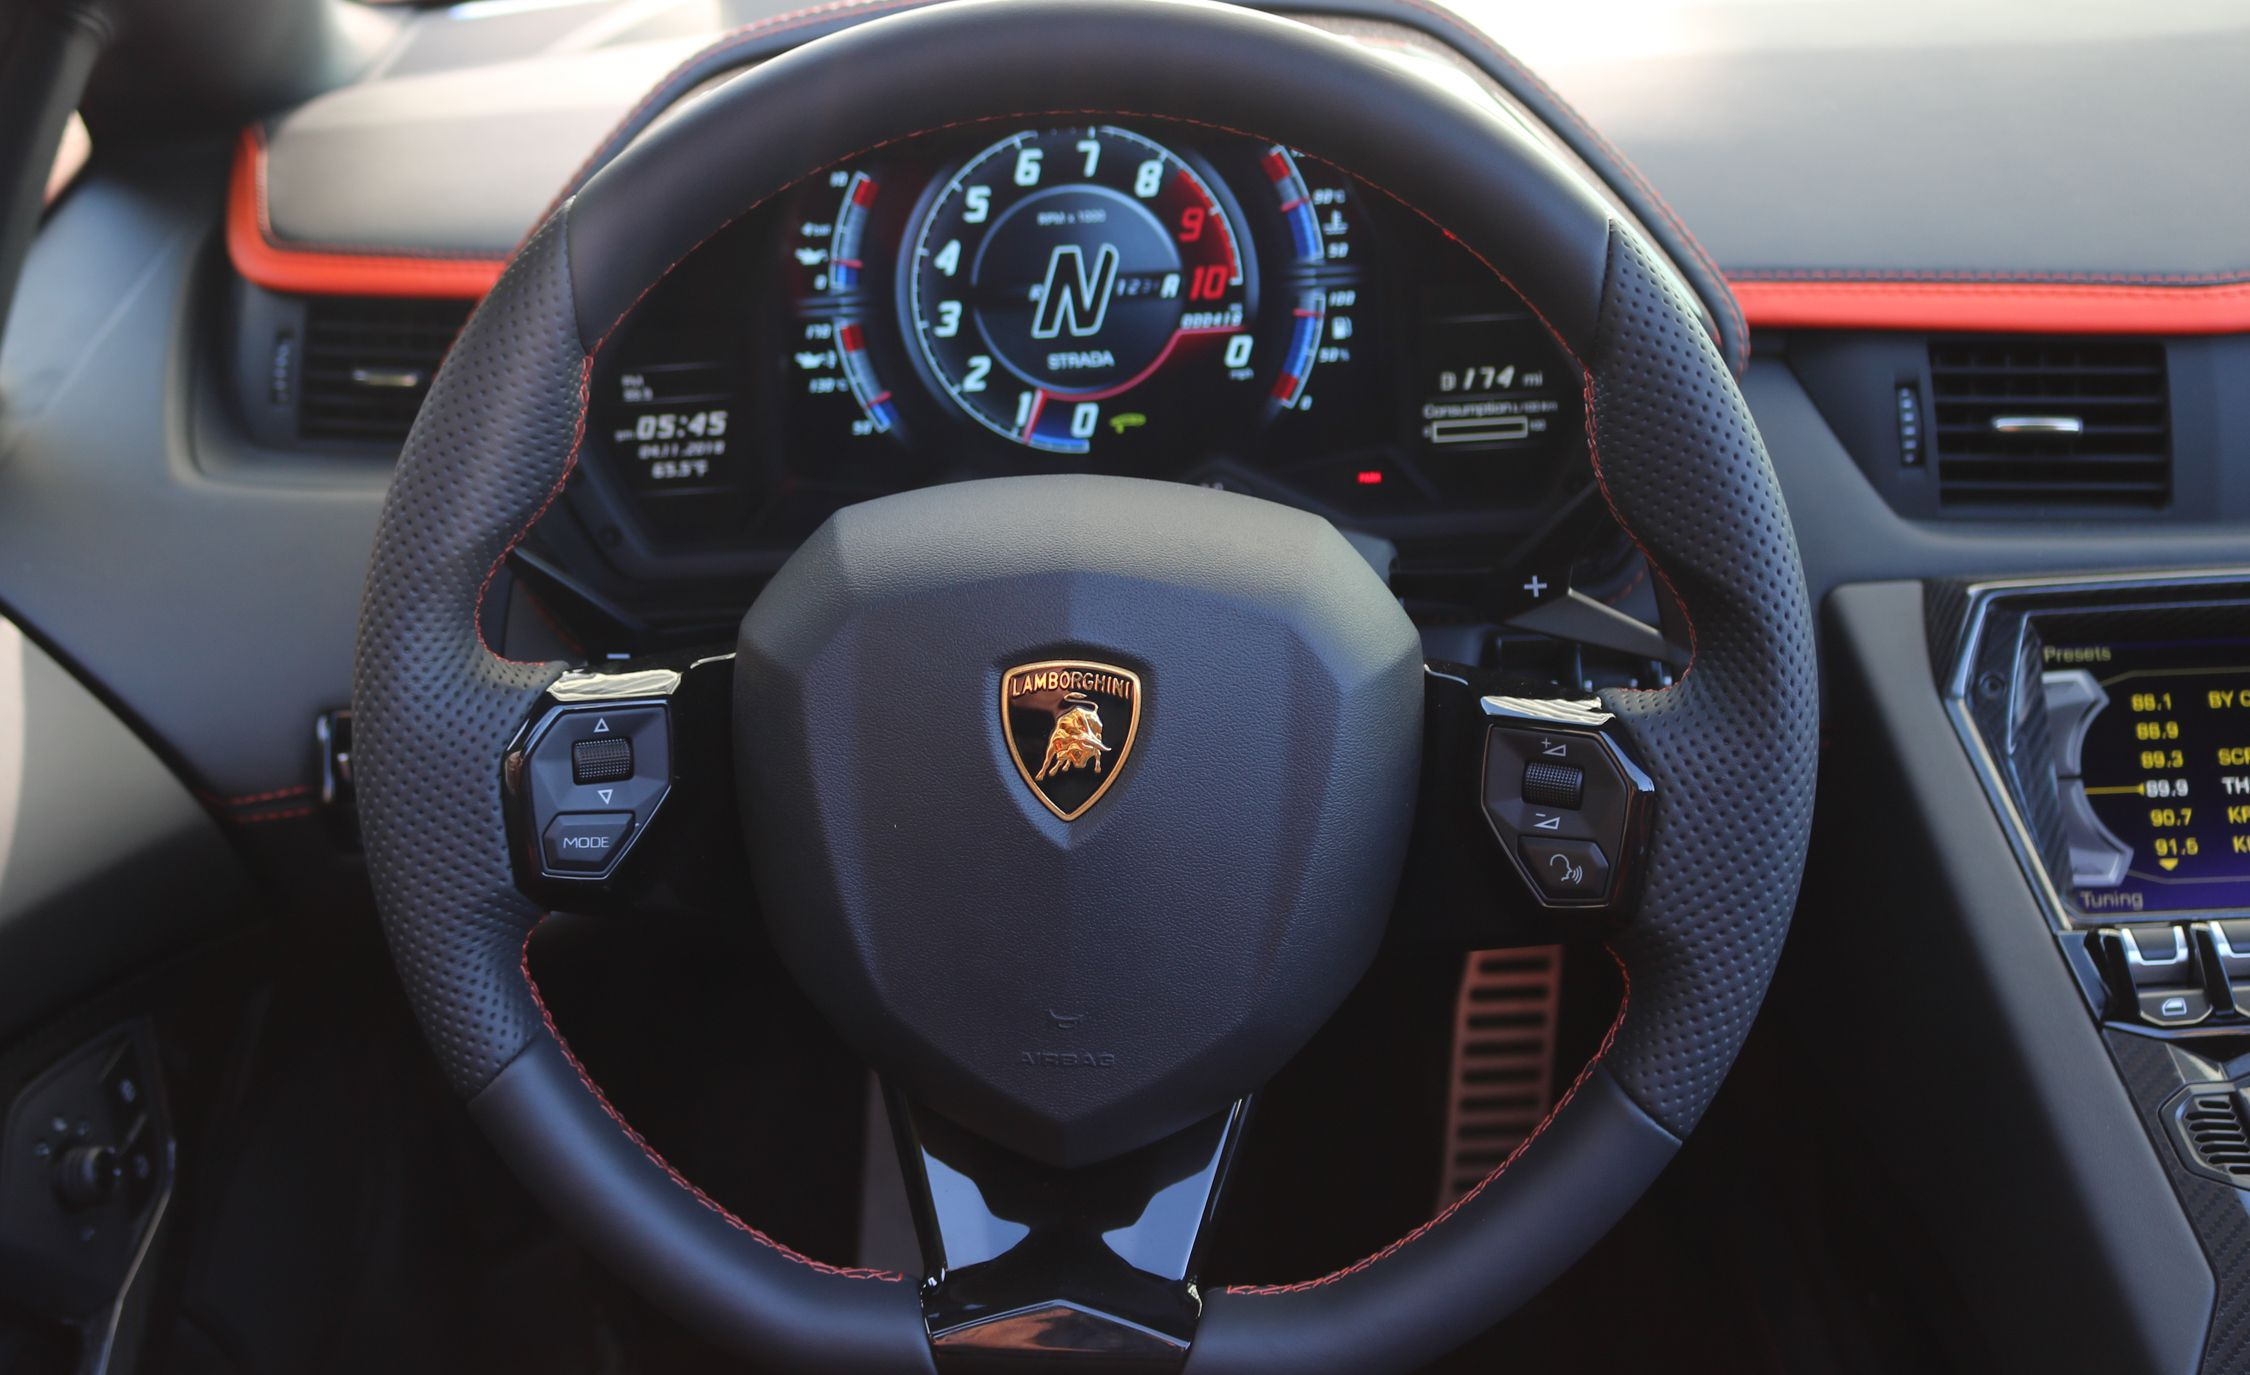 2018 Lamborghini Aventador S Roadster Interior Steering